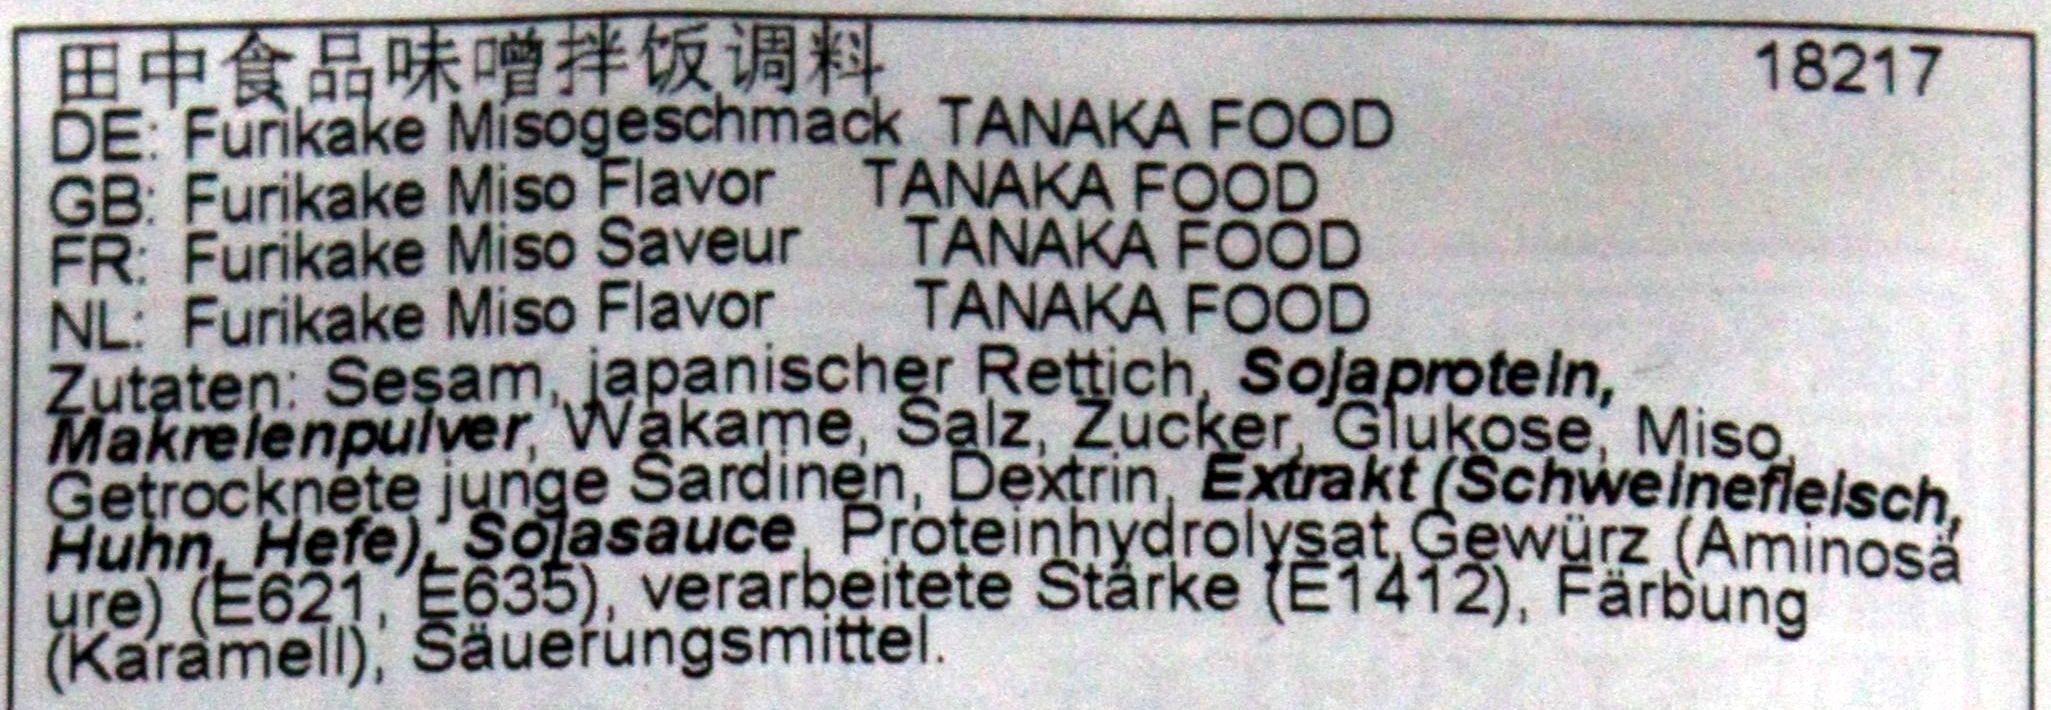 Furikake Misogeschmack - Ingredients - de